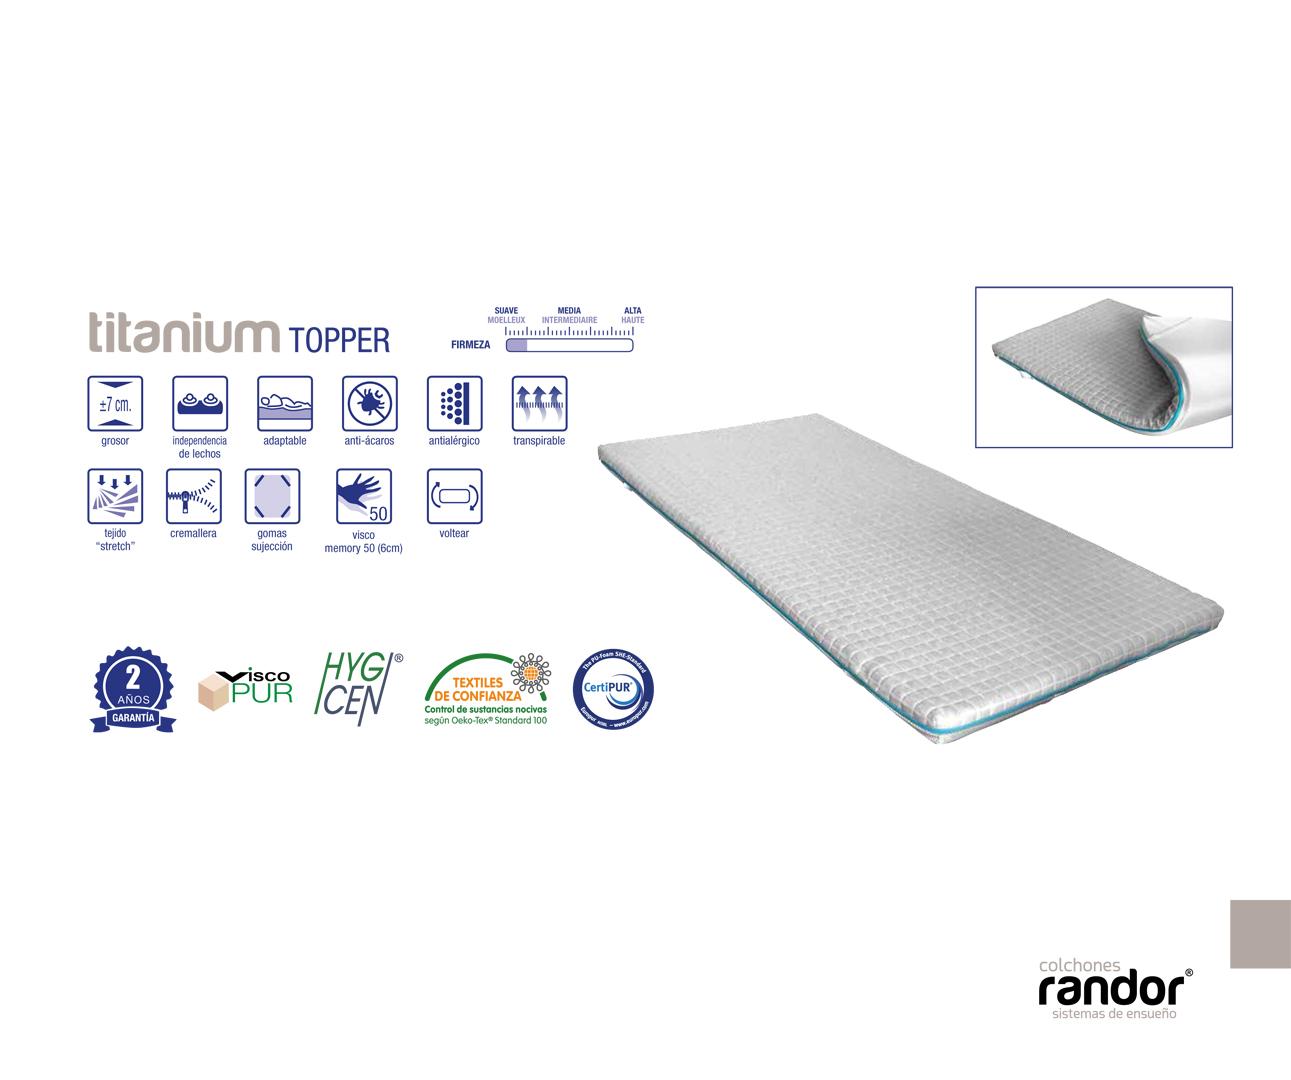 colchones randor topper titanium